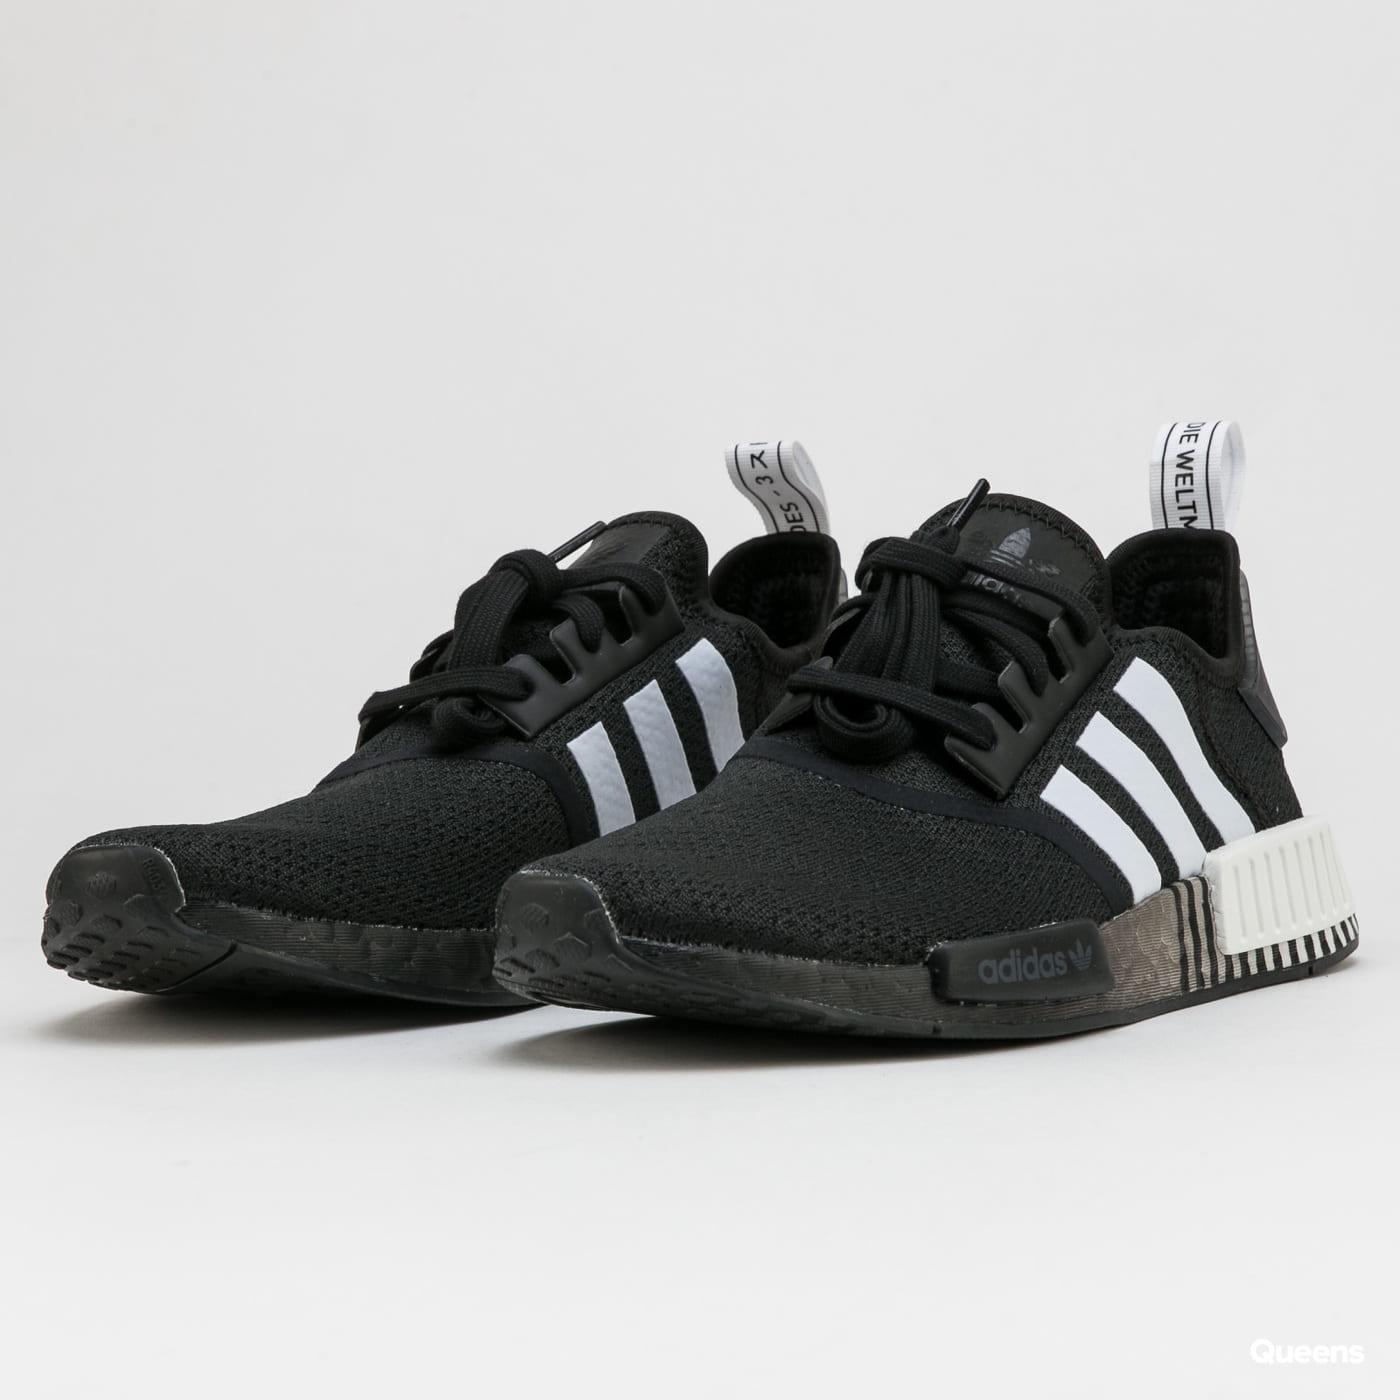 Sneakers adidas Originals NMD_R1